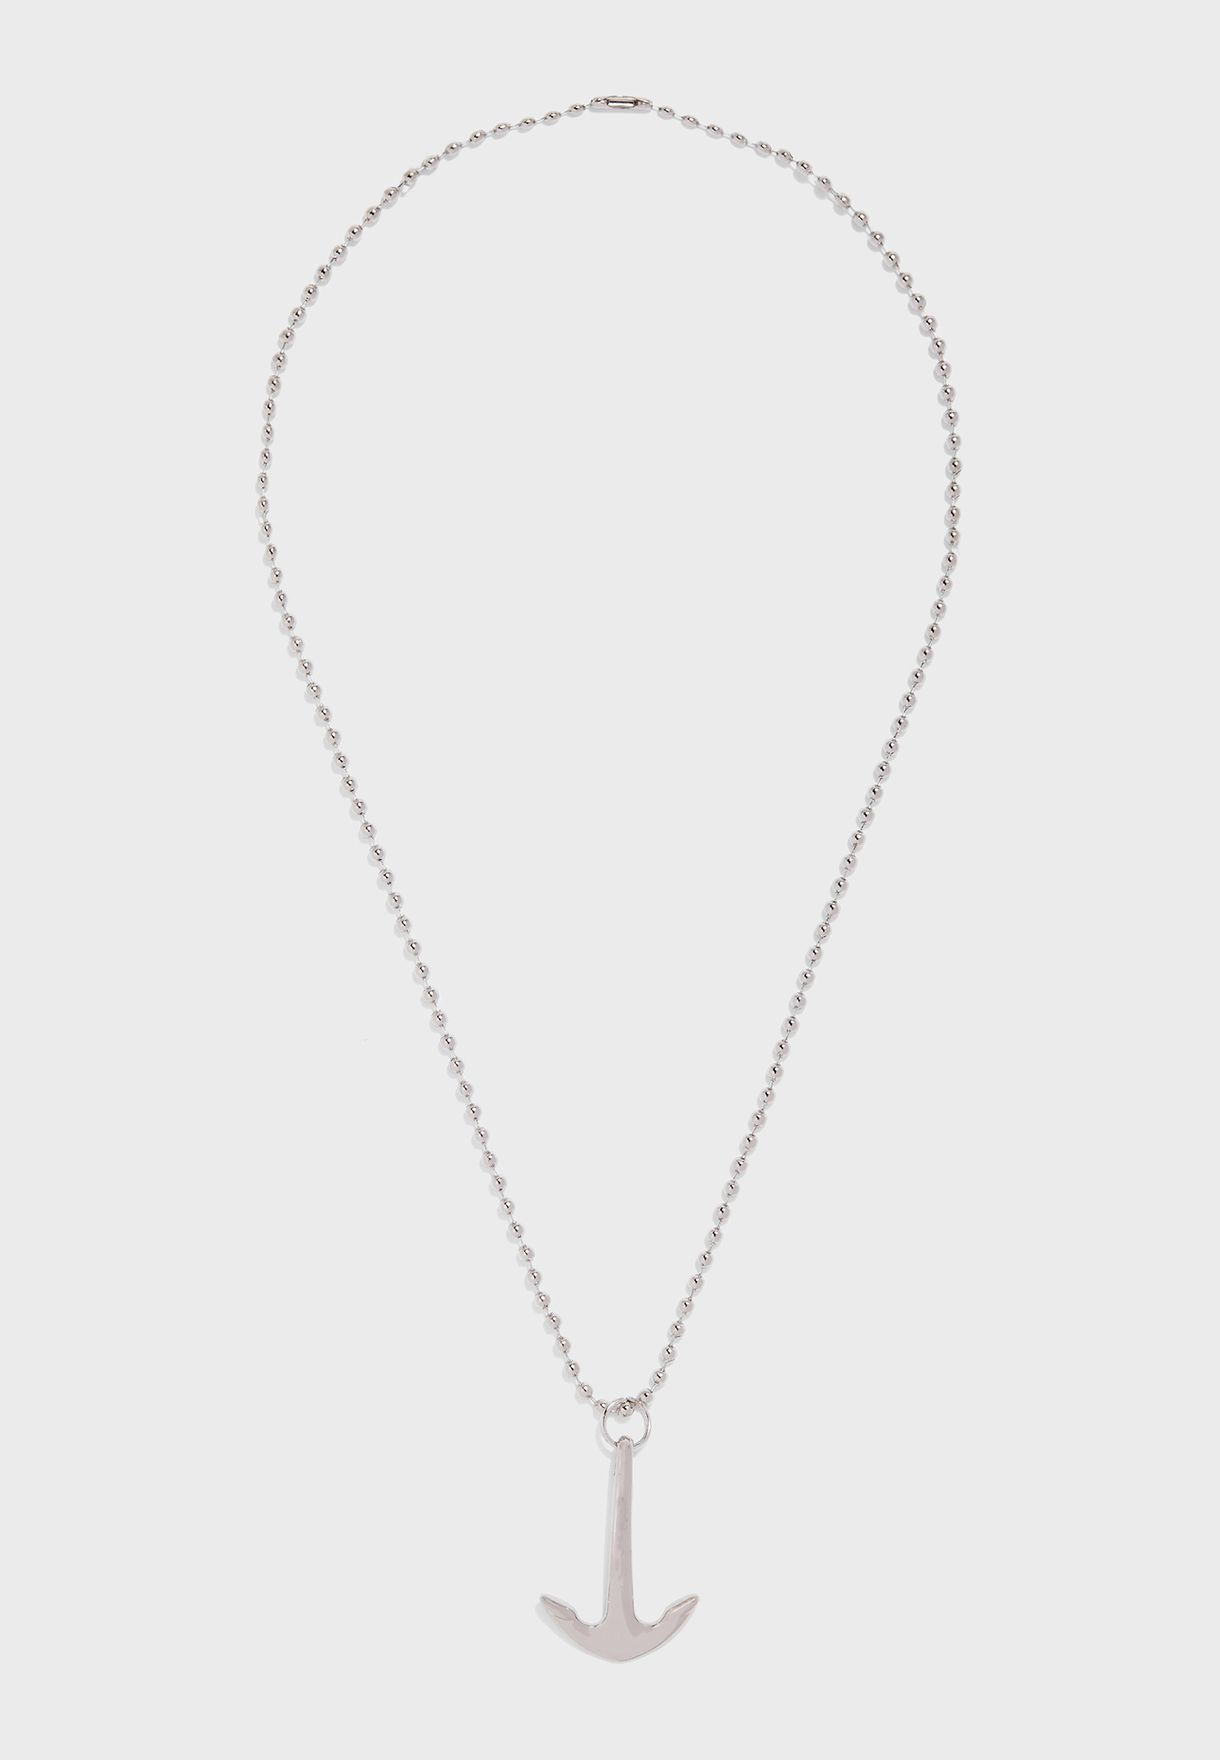 Anchor Long Necklace